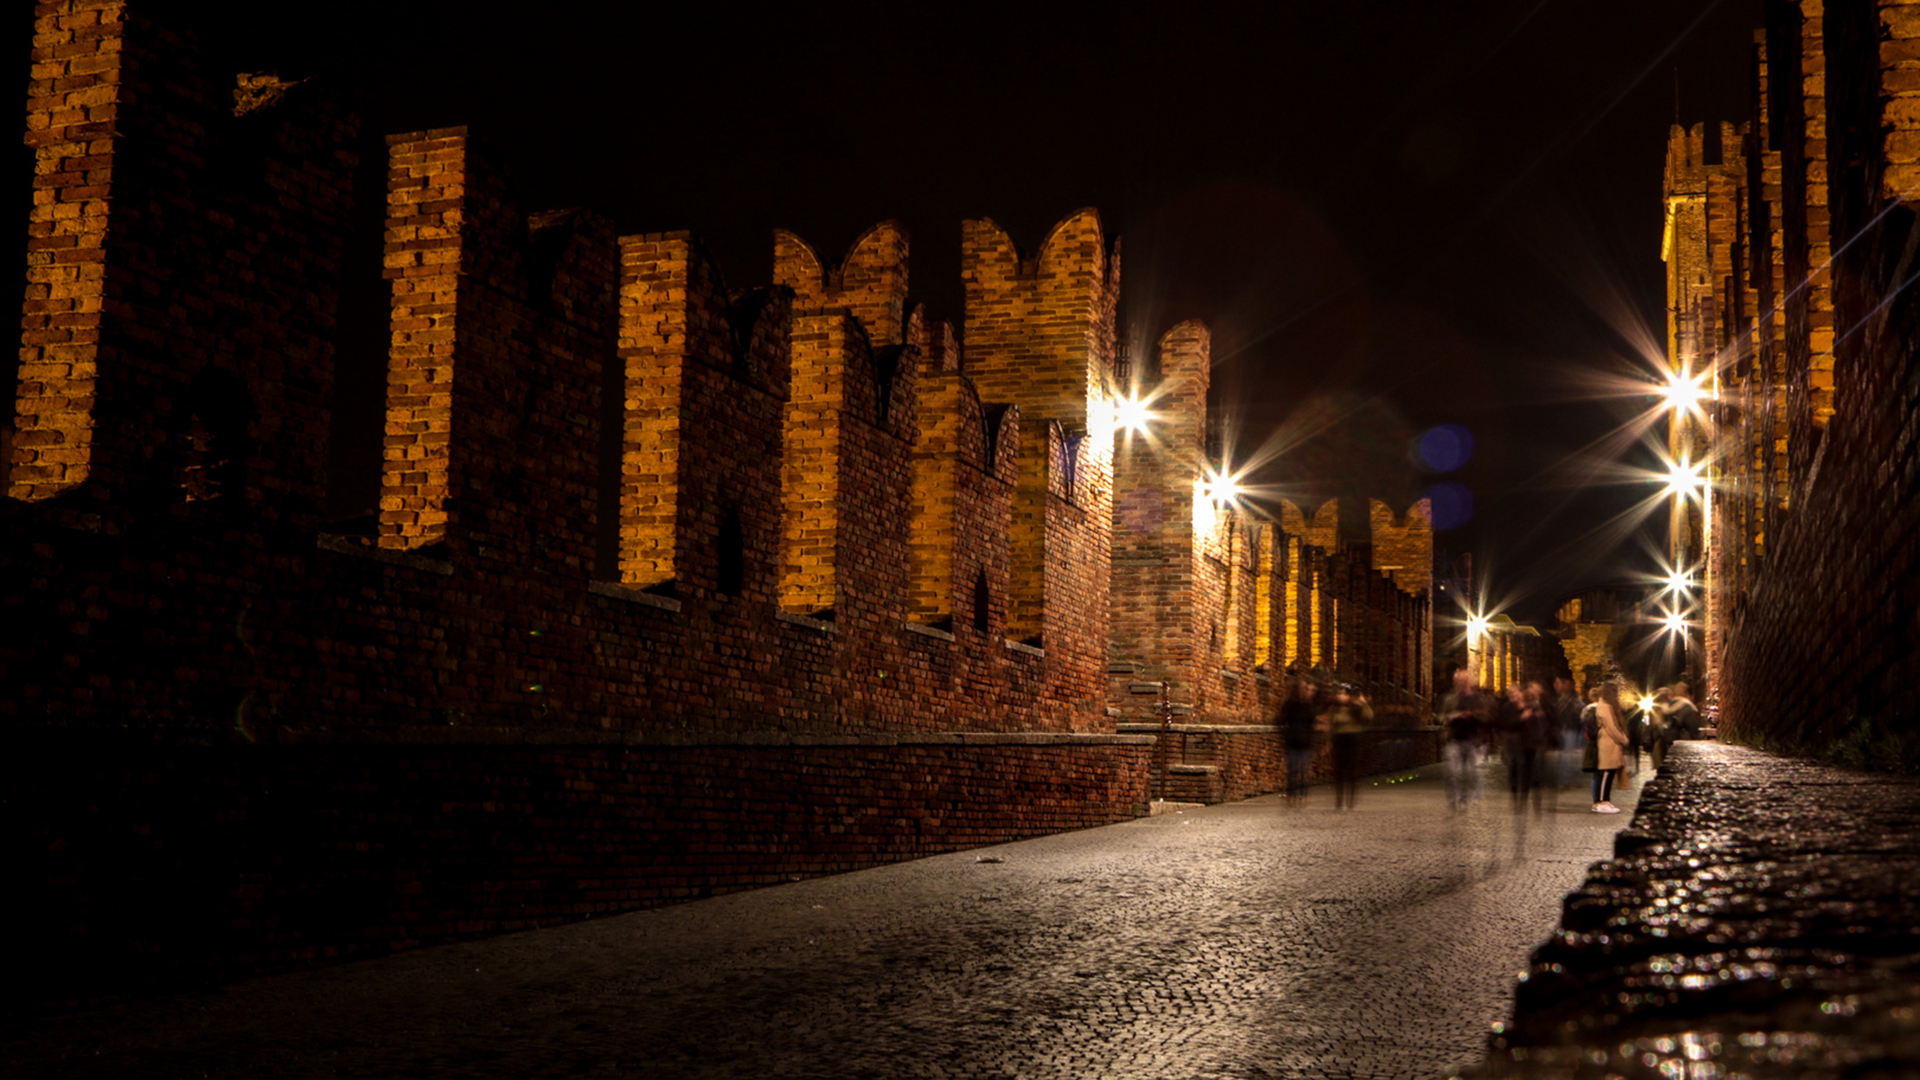 Summer night walk in Verona 25.08.21